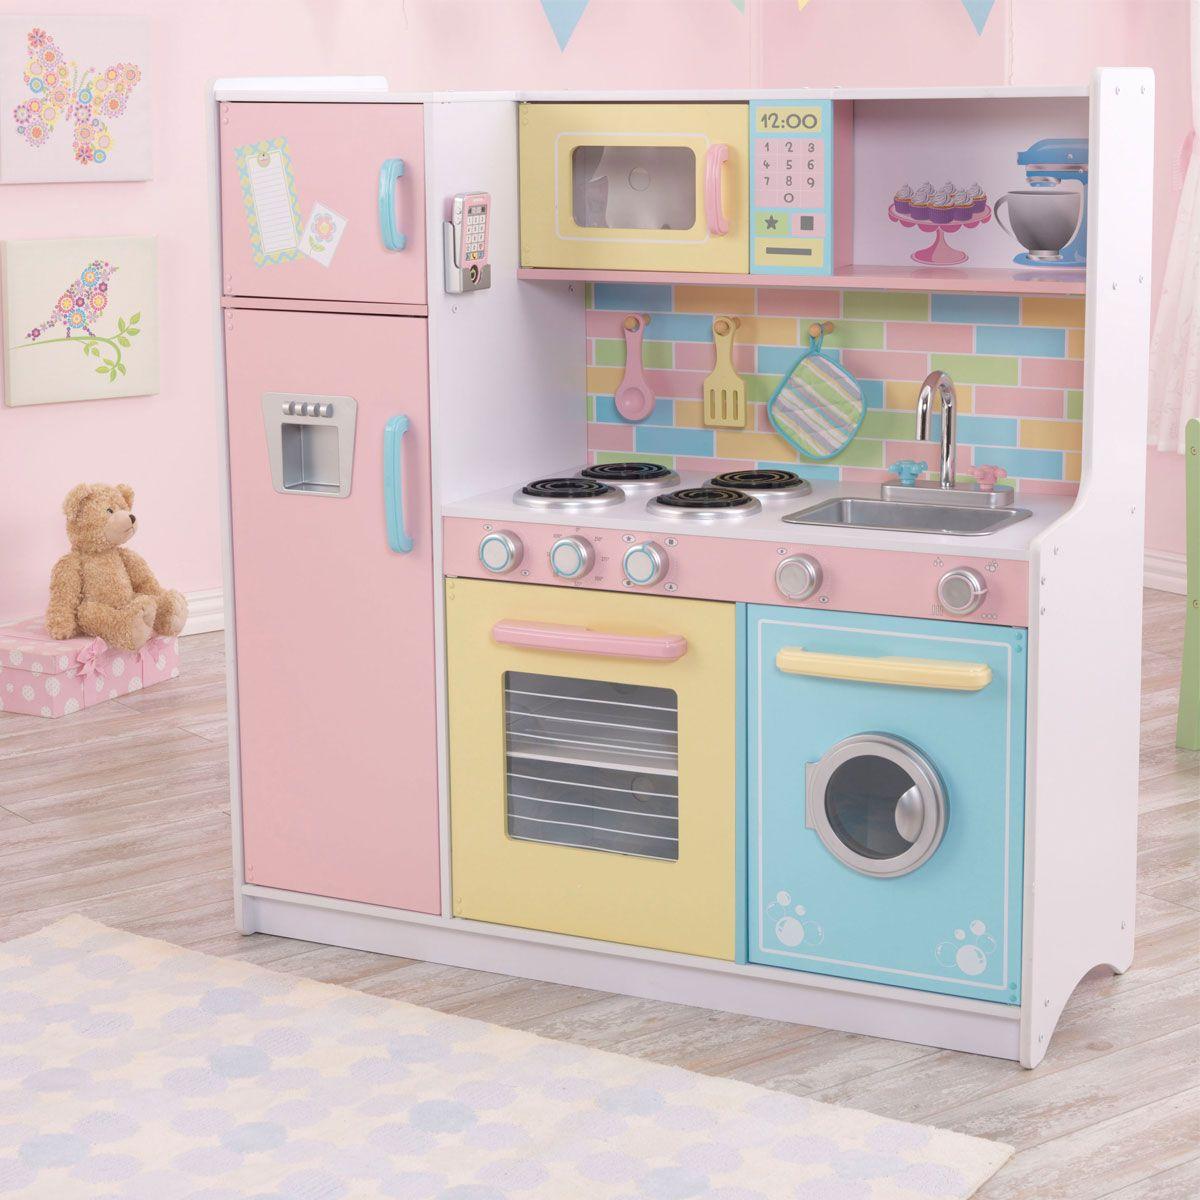 Kidkraft Deluxe Culinary Kitchen Kinderkuche Spielzeug Kuche